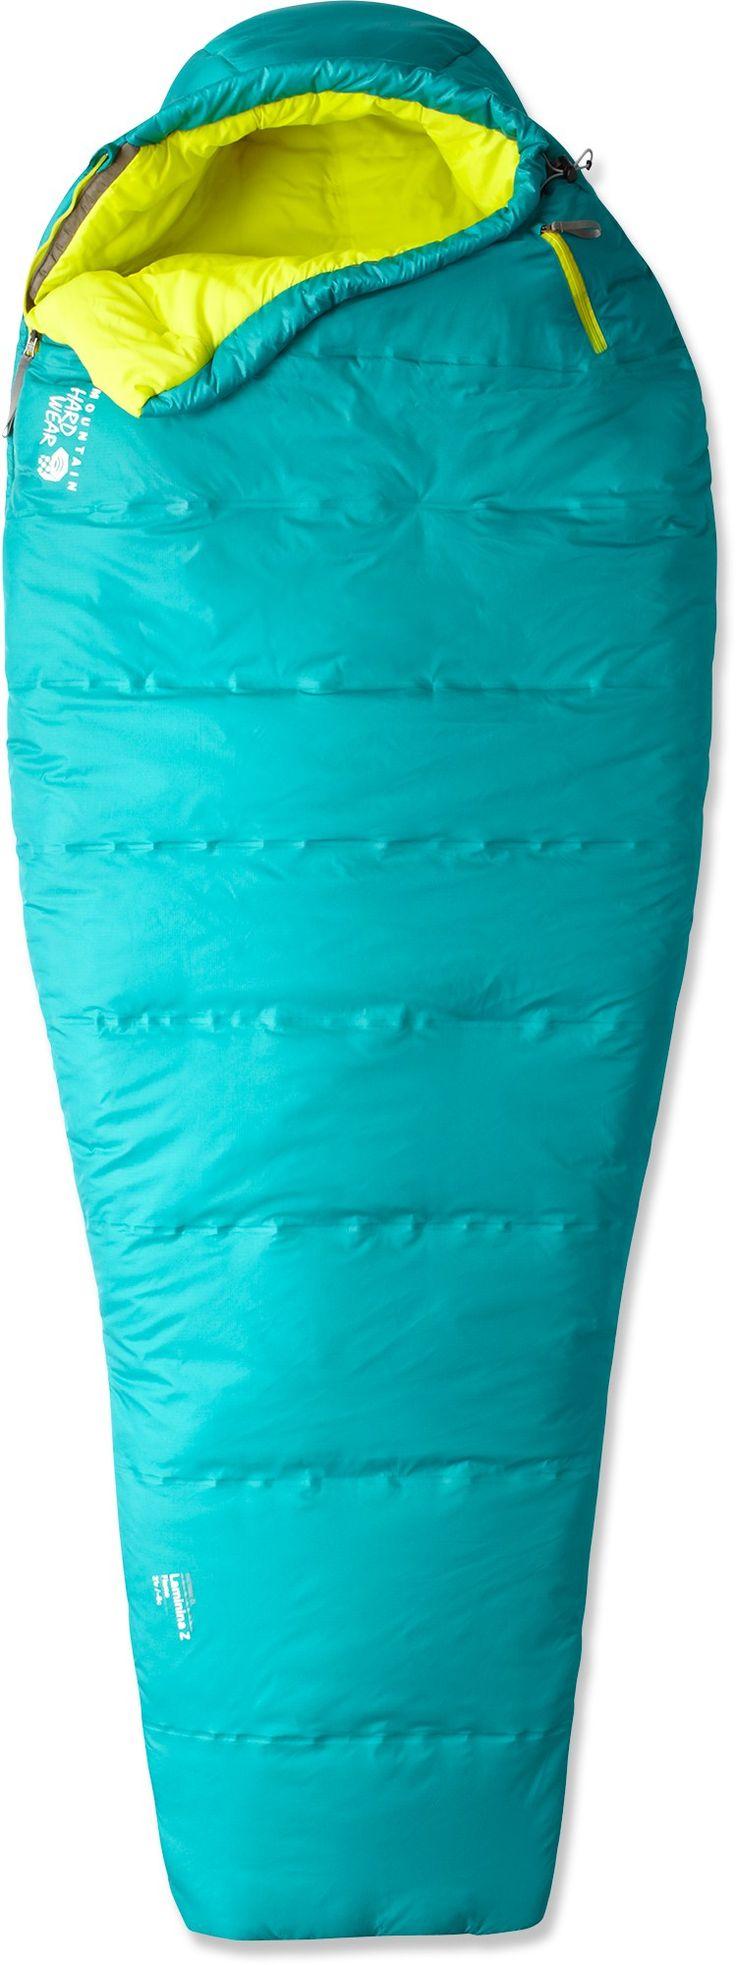 Mountain Hardwear Female Laminina Z Flame Sleeping Bag - Women's